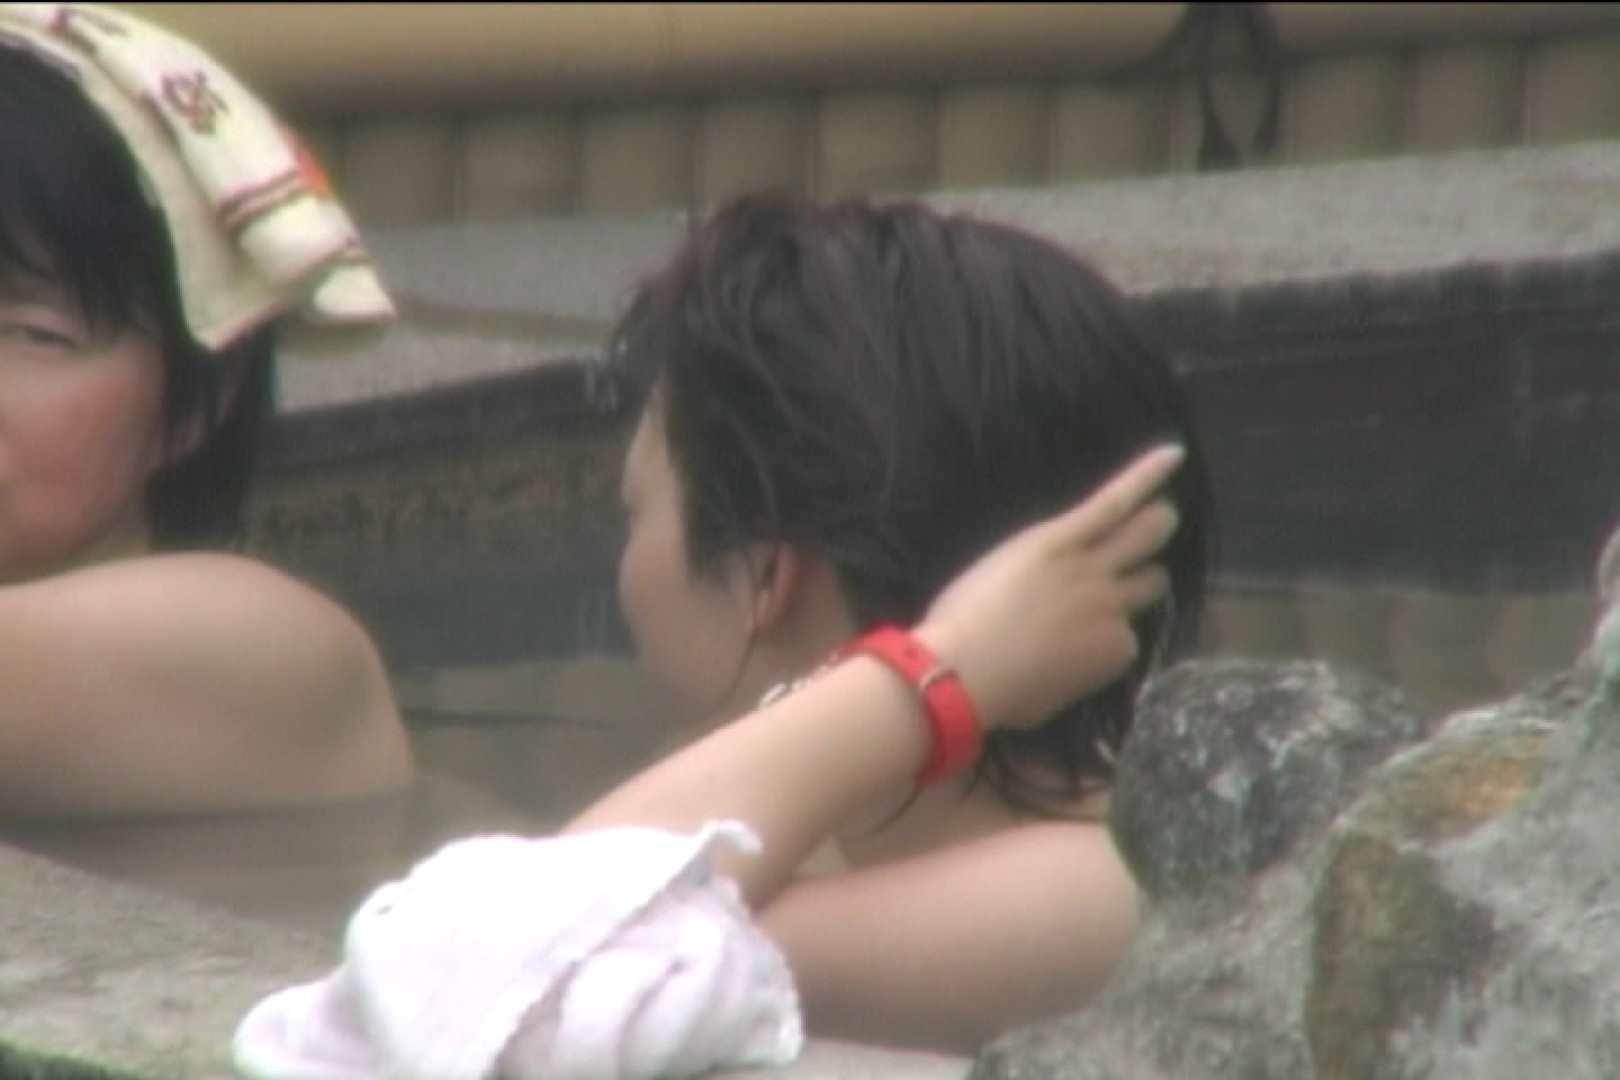 Aquaな露天風呂Vol.122 HなOL   0  107pic 93